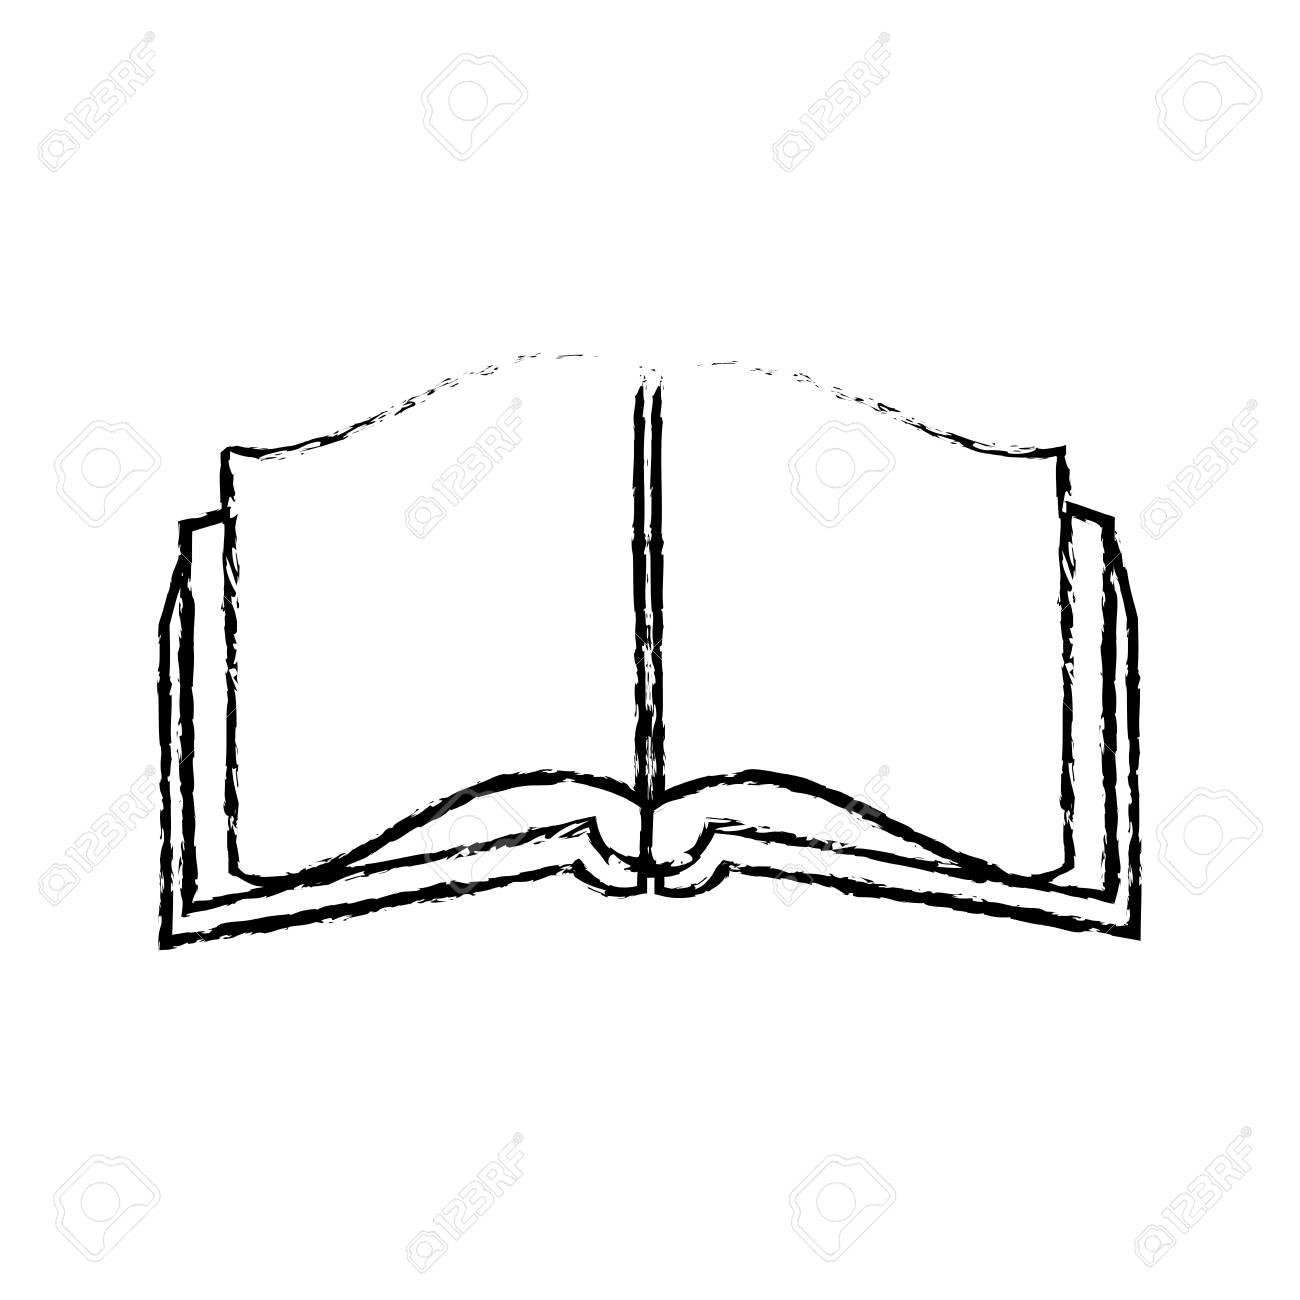 open book literature encyclopedia learn vector illustration stock vector -  80645516